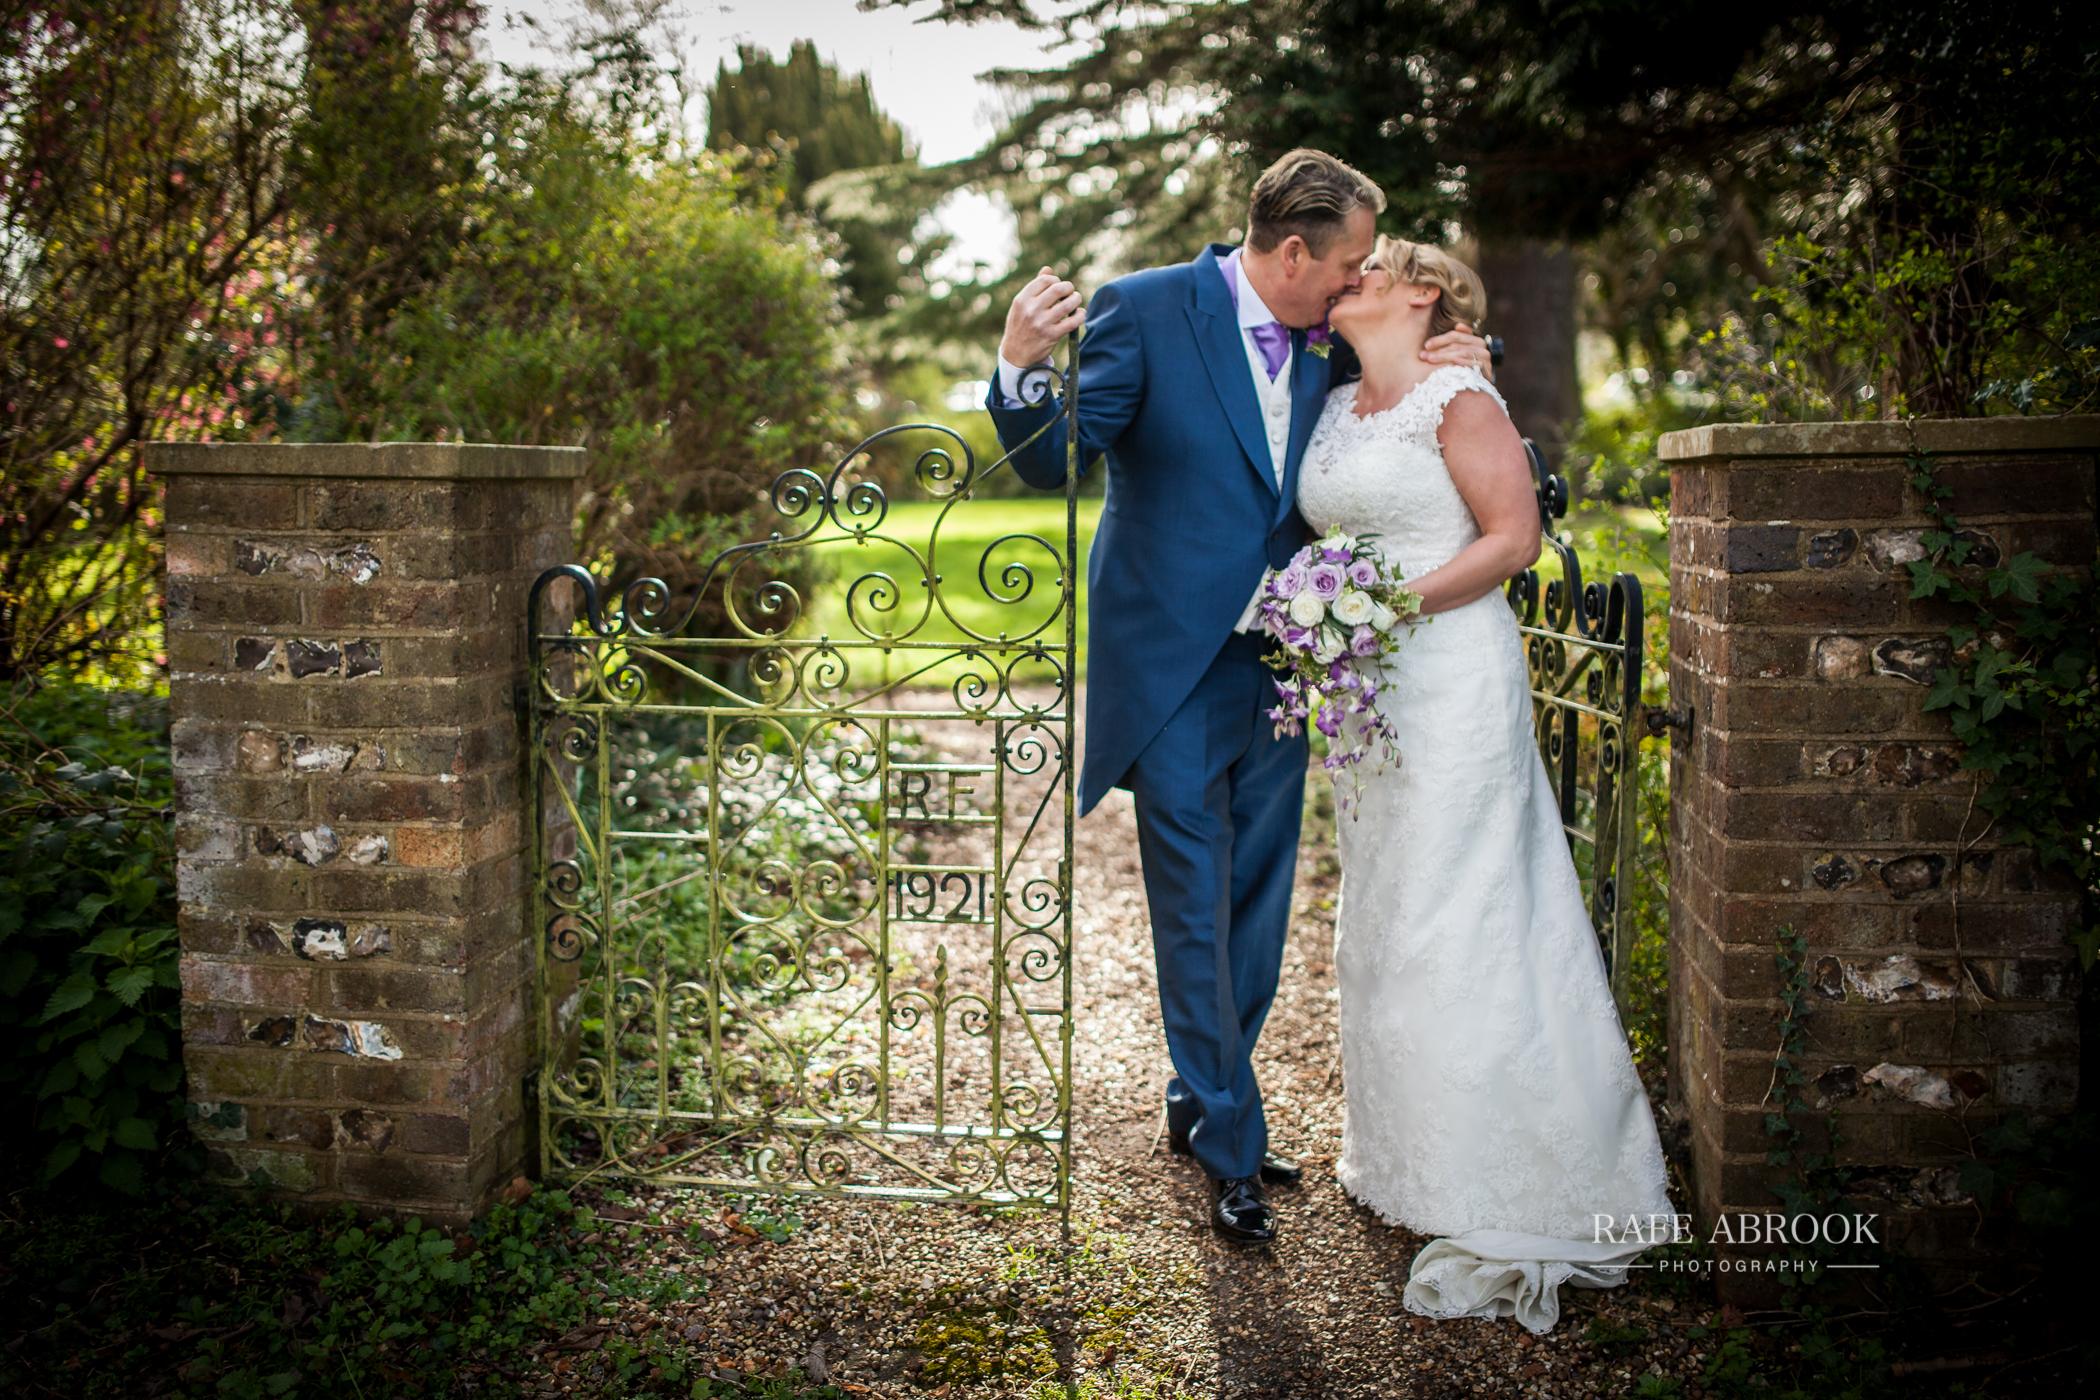 louise & john wedding all saints church kings langley-684.jpg